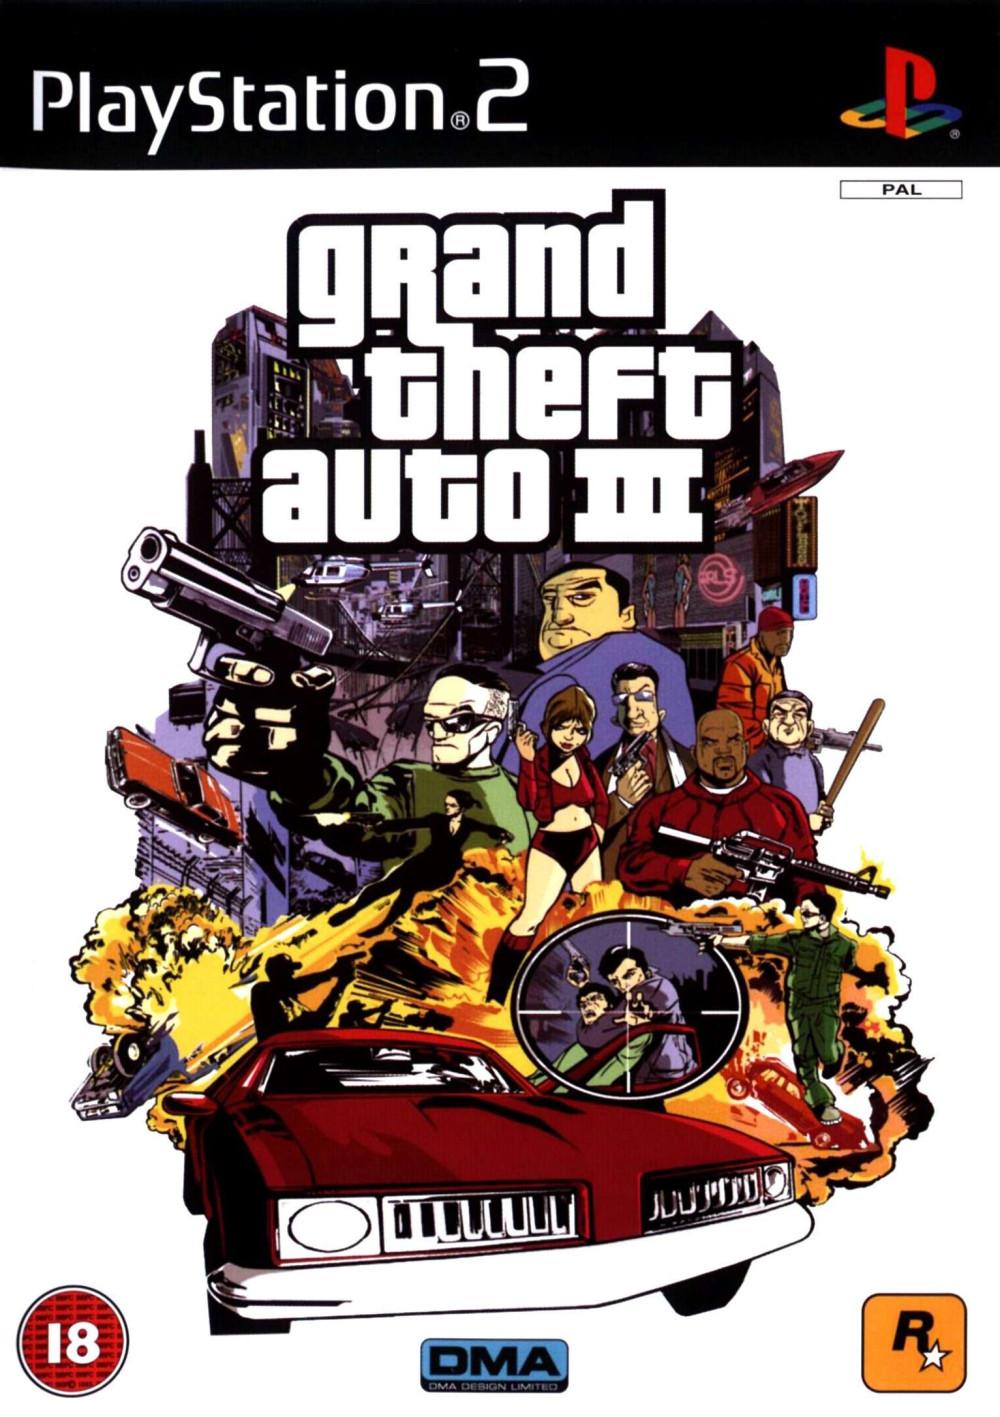 Grand Theft Auto III GTA 3 PS2